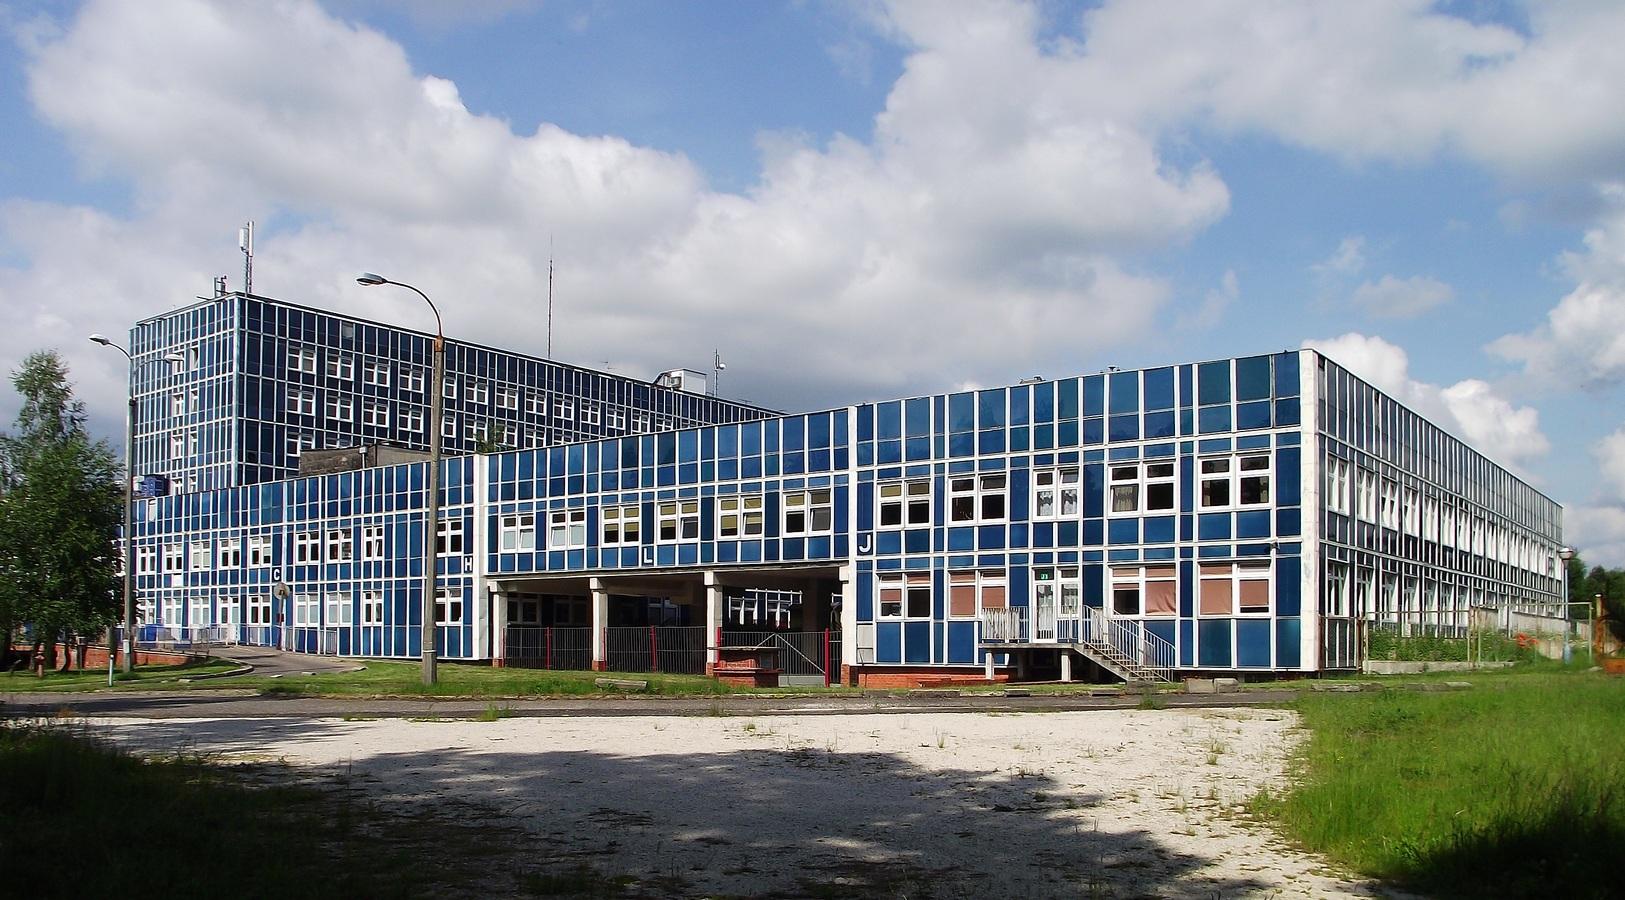 piła szpital - fotopolska.eu